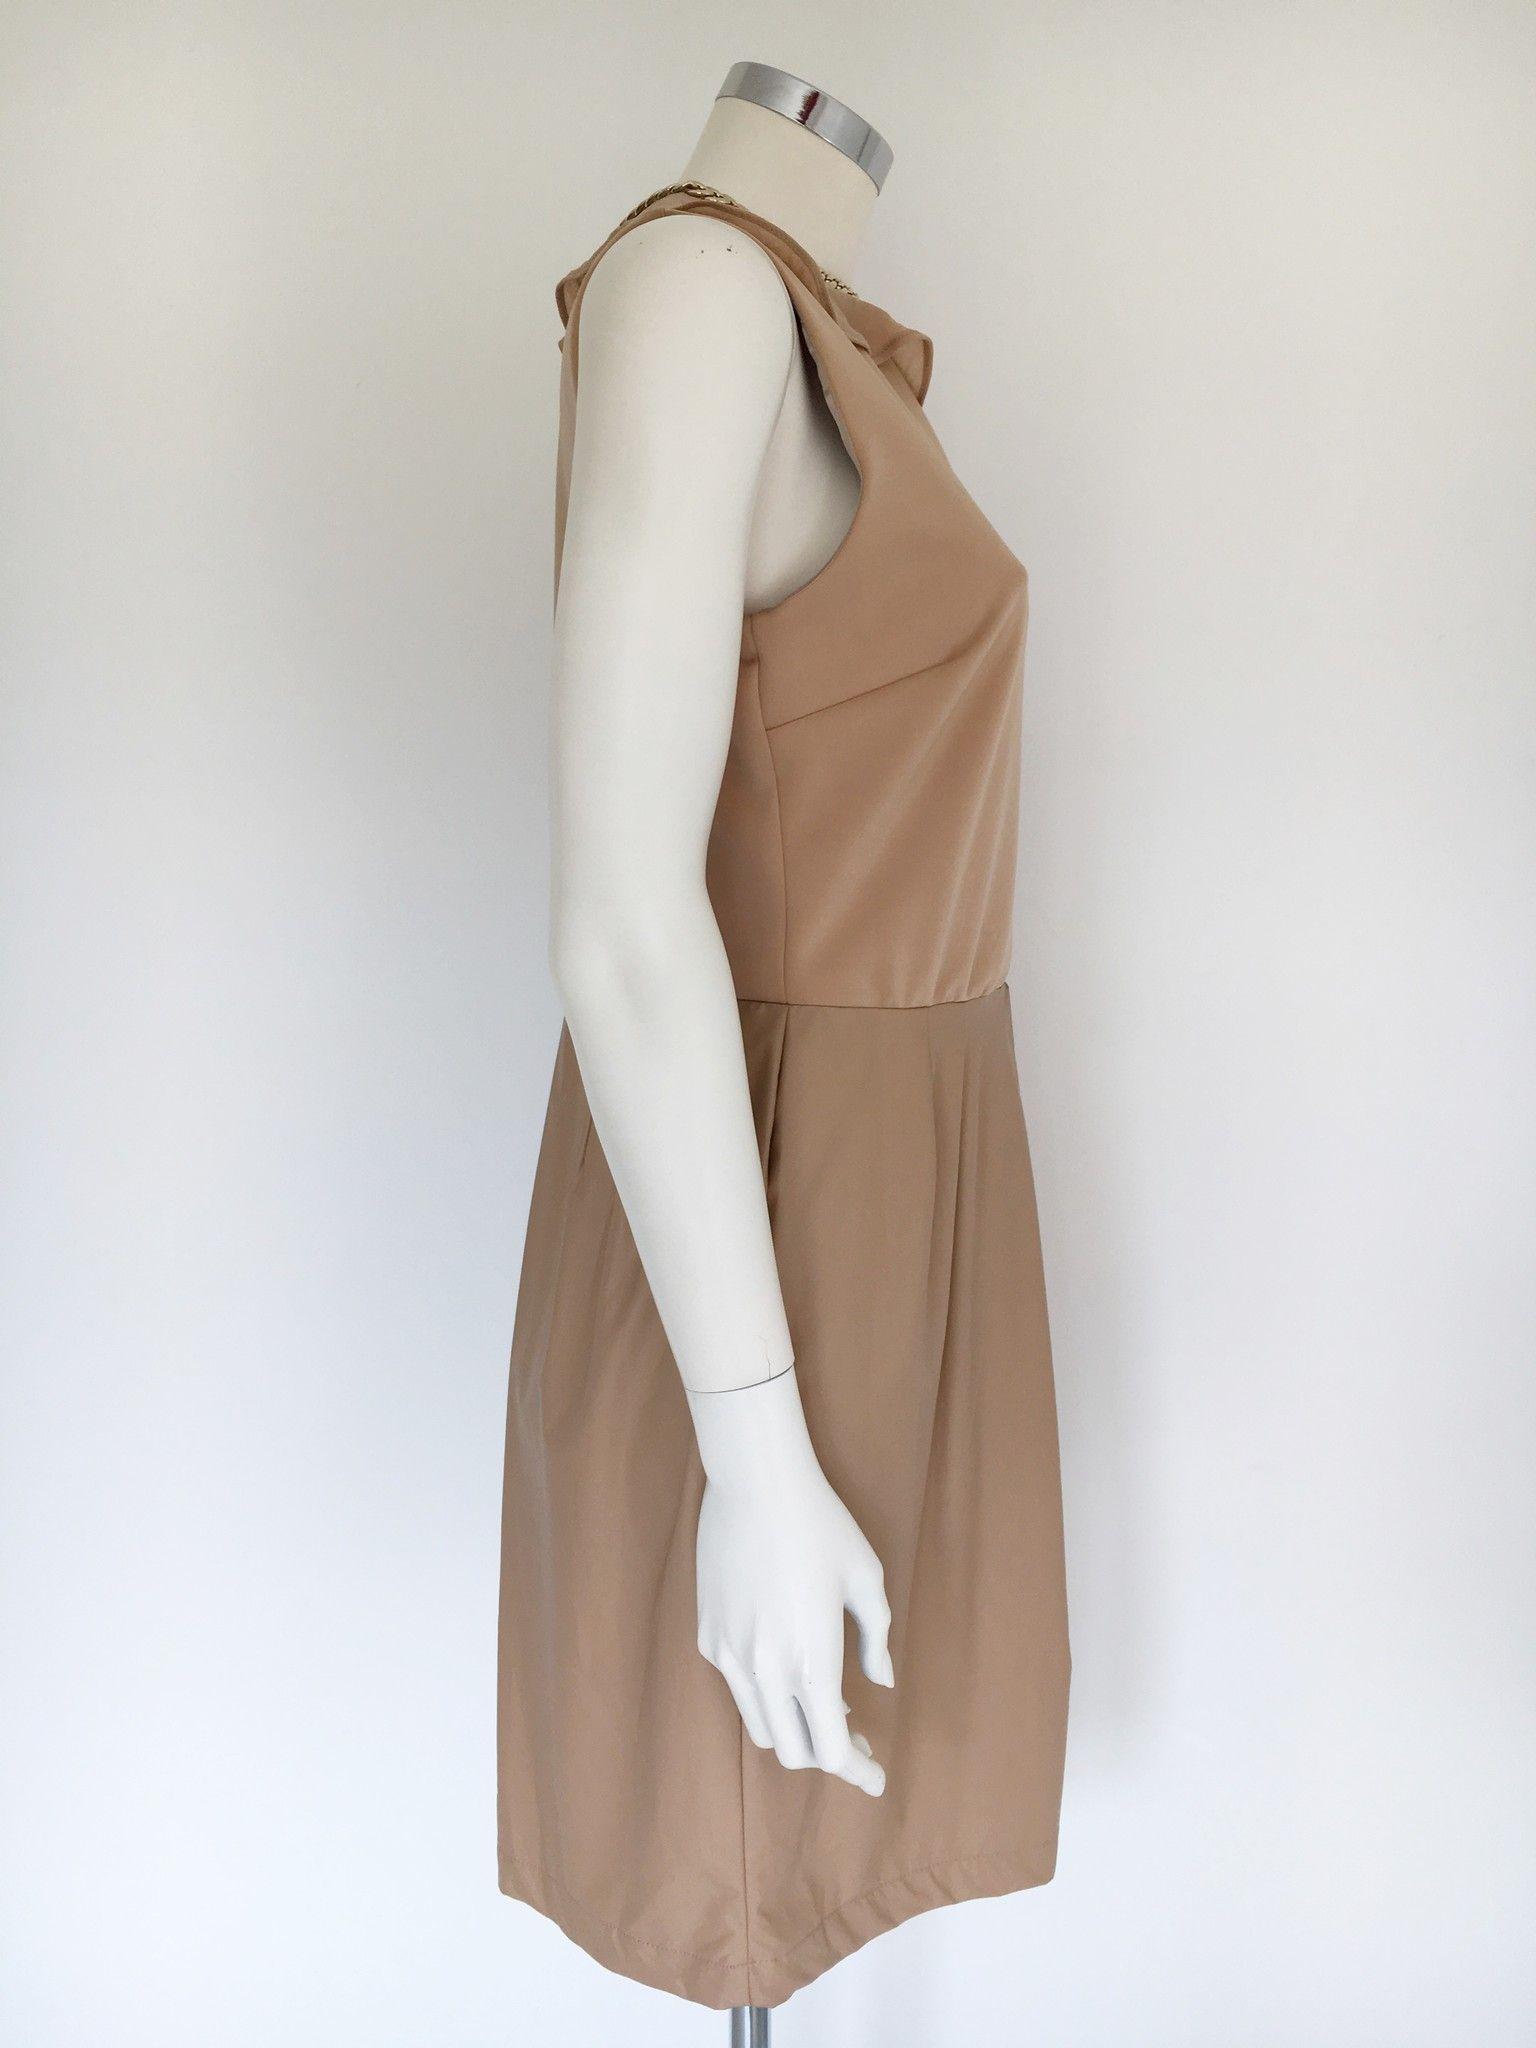 Roberta Biagi Sleeveless Dress Cod.ABI9707